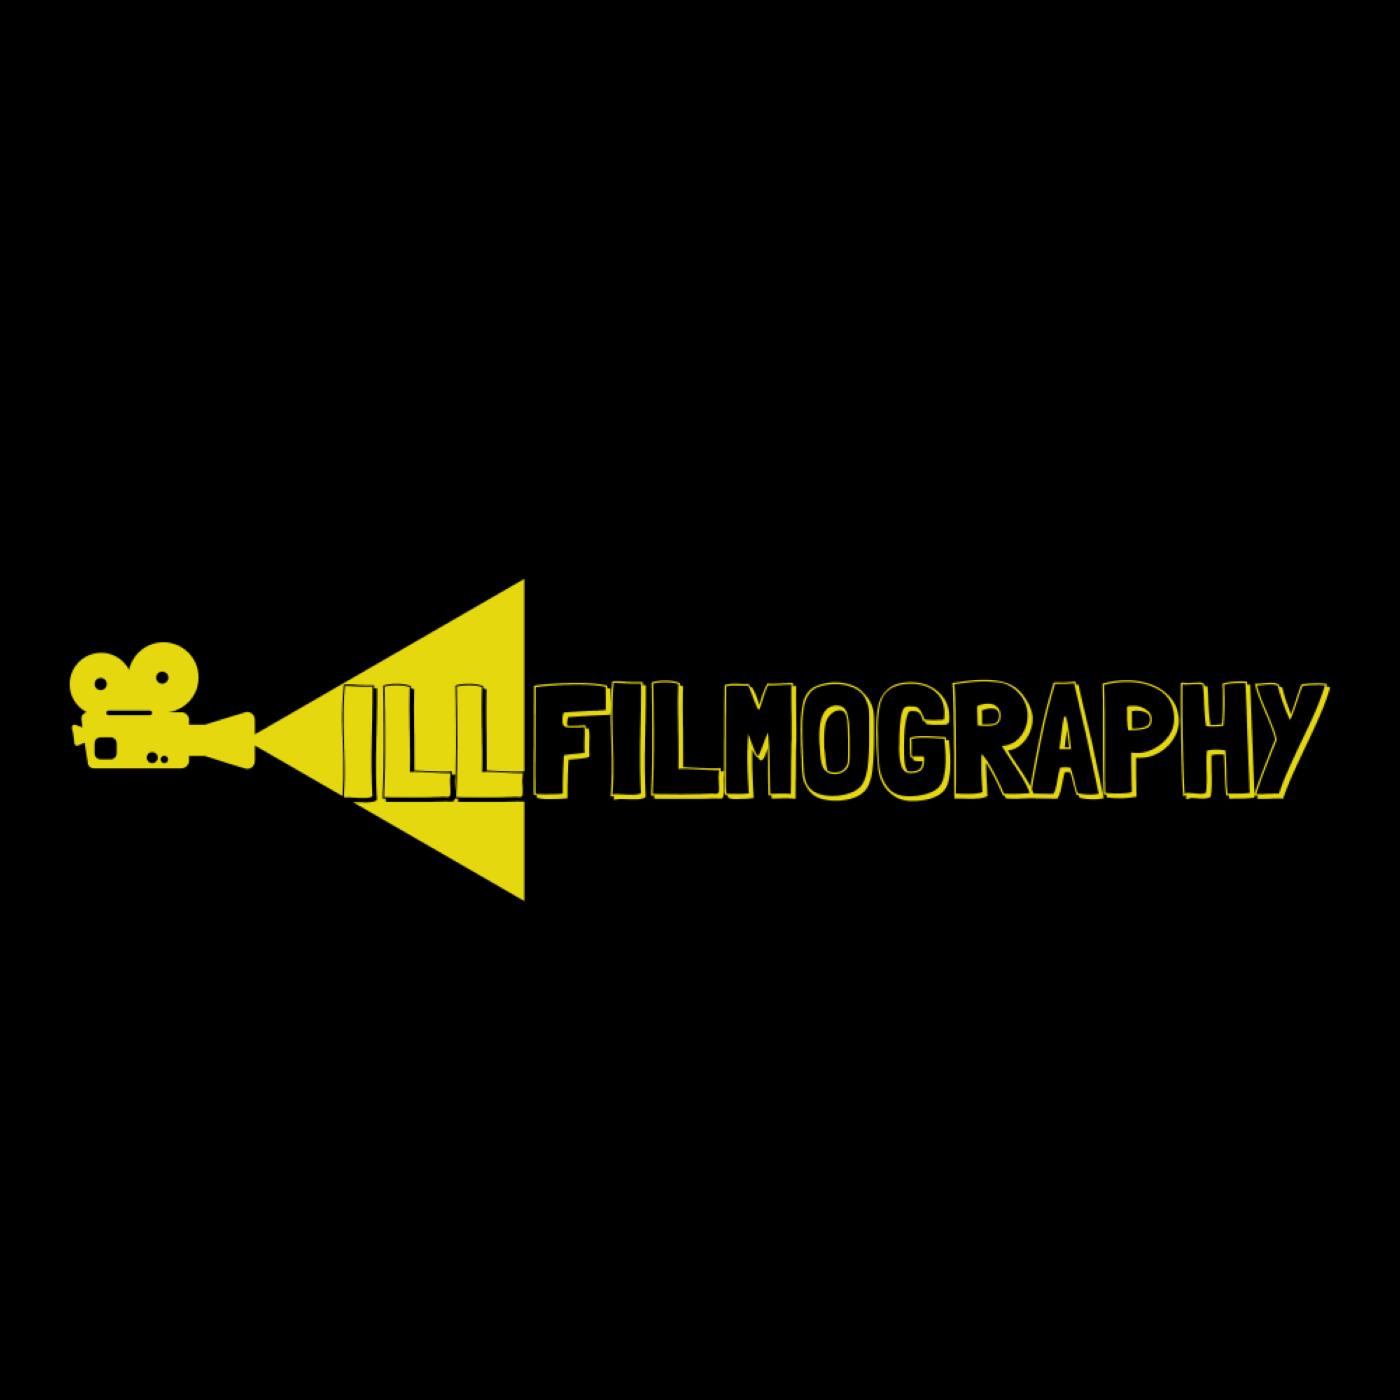 ILL FILMOGRAPHY show art